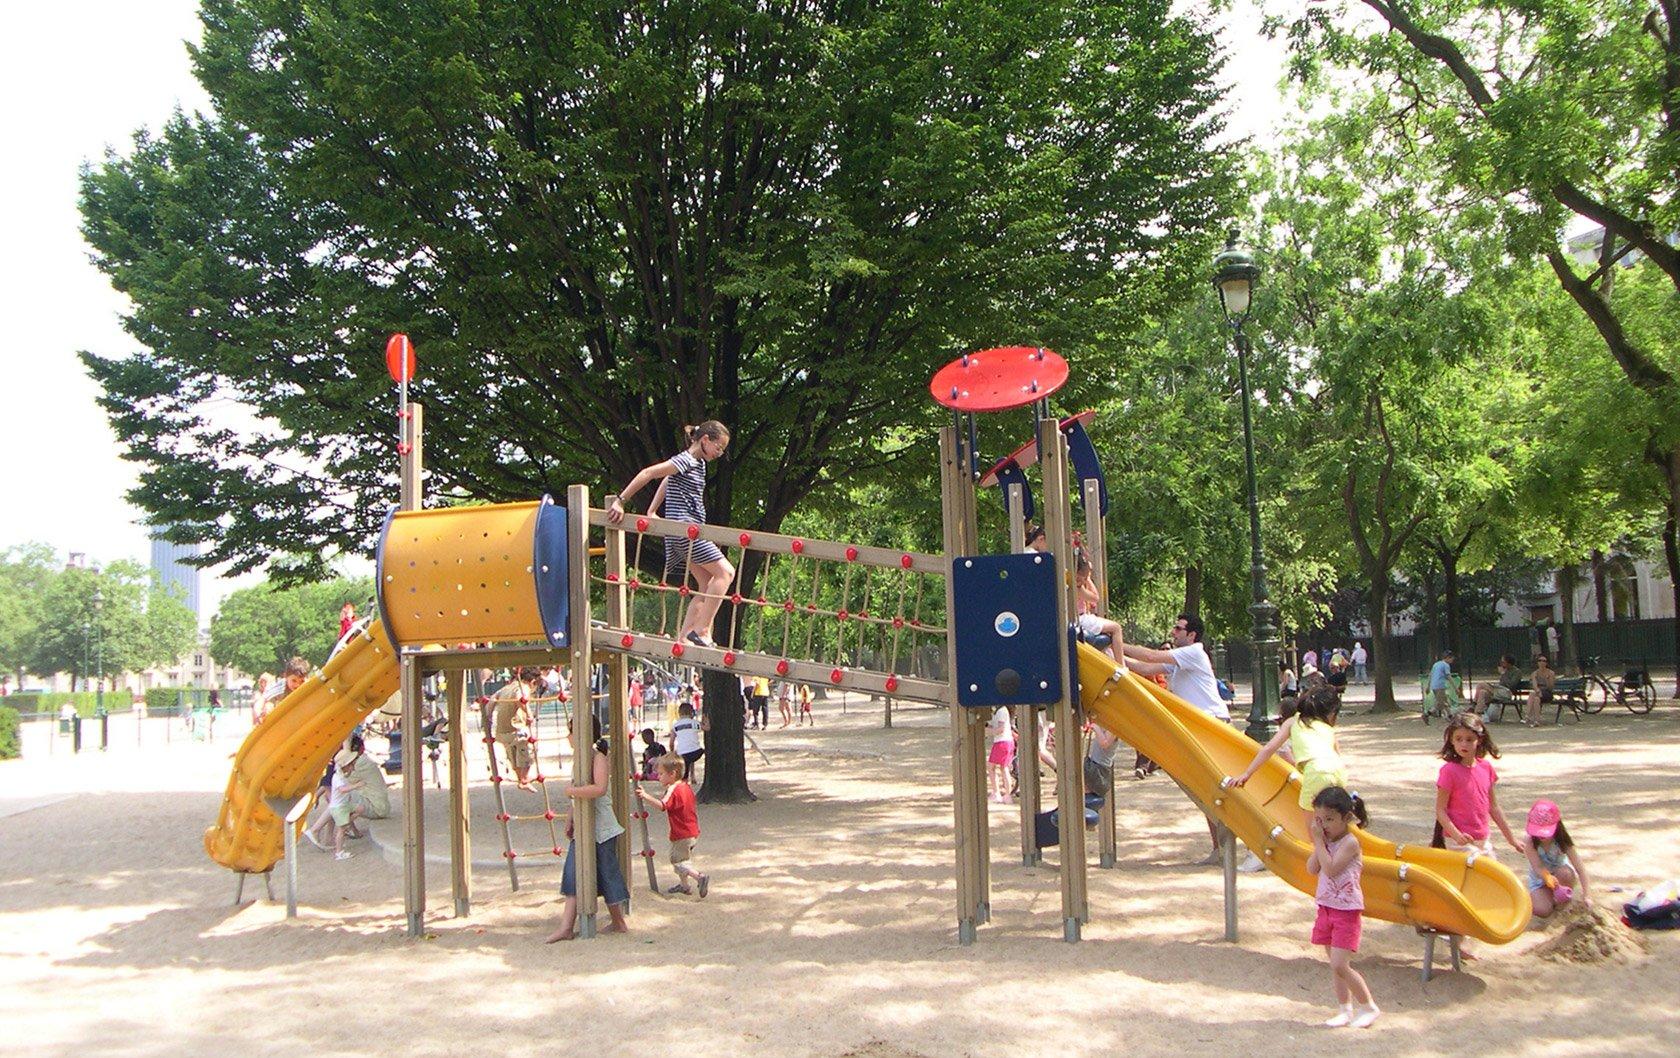 champs-de-mars-playground